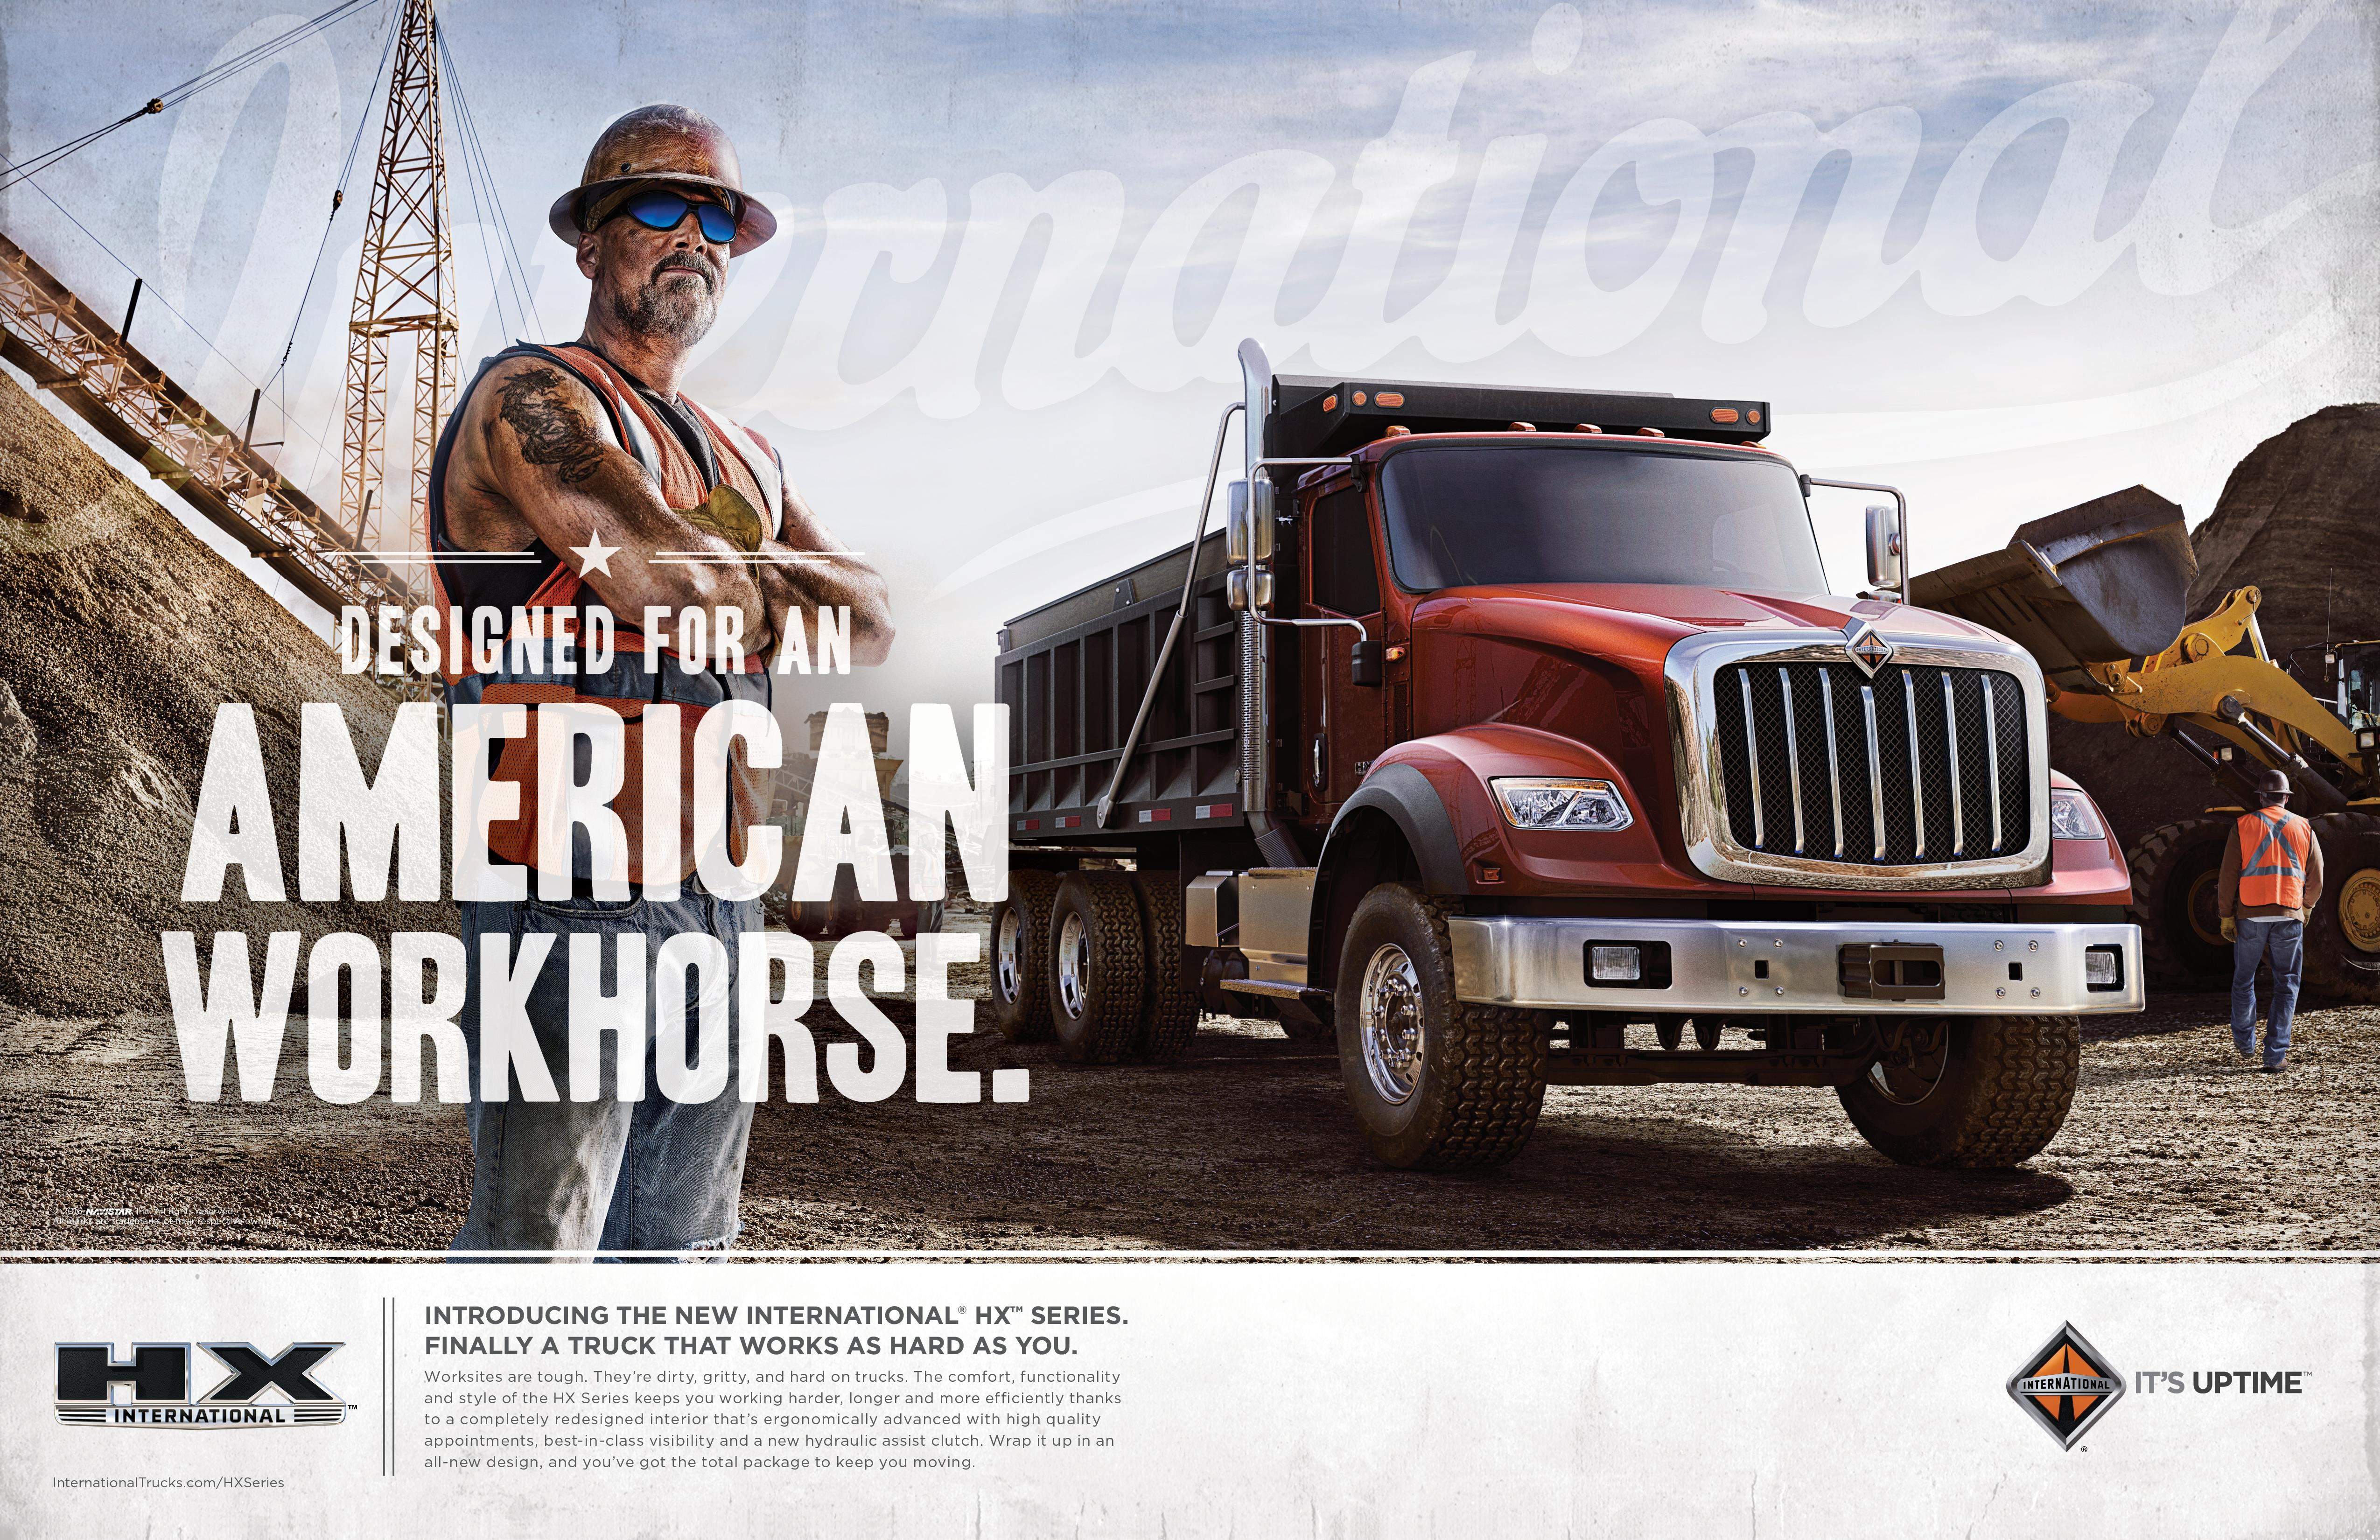 International Trucks: Designed for an American Workhouse